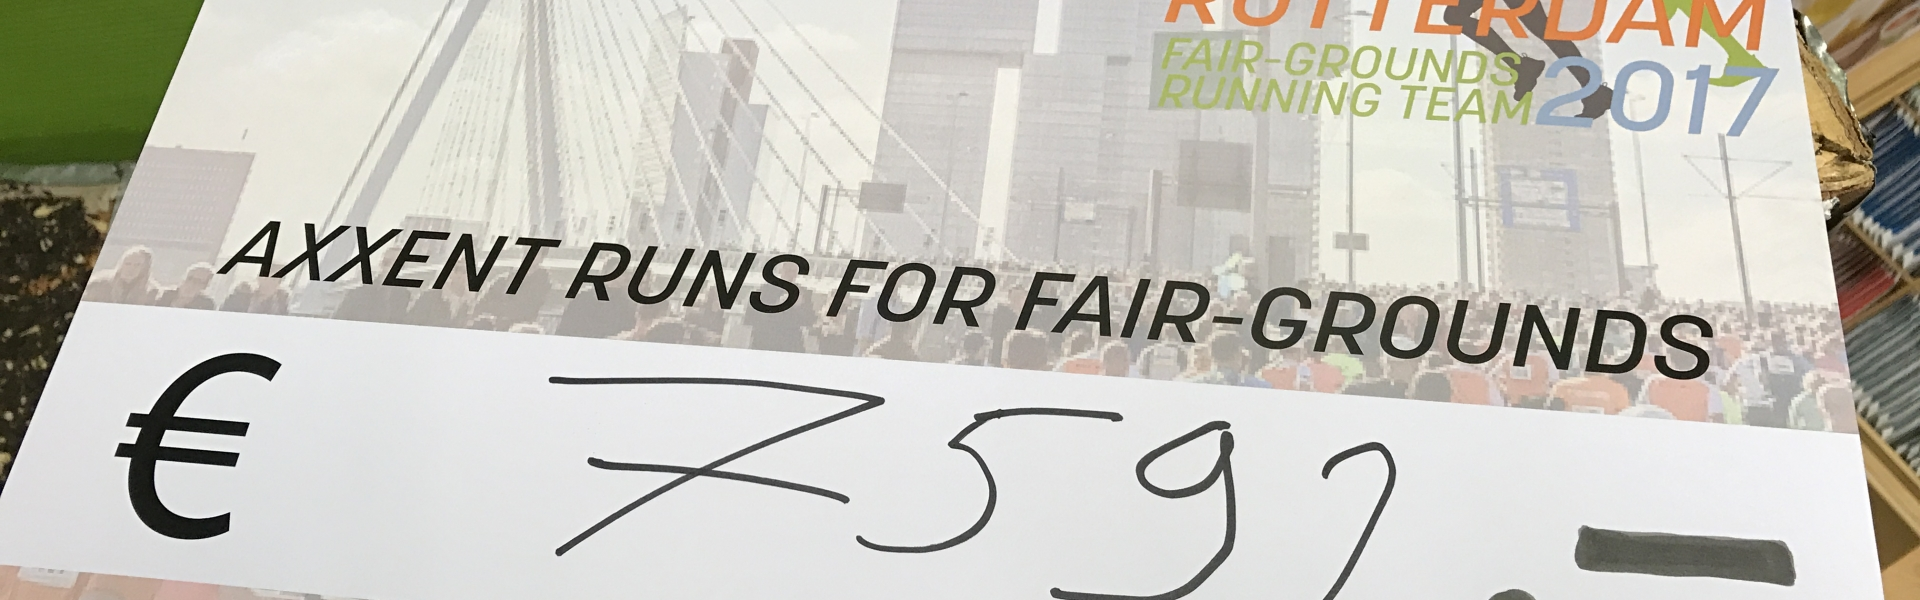 Fair-grounds running team finished the Rotterdam Marathon